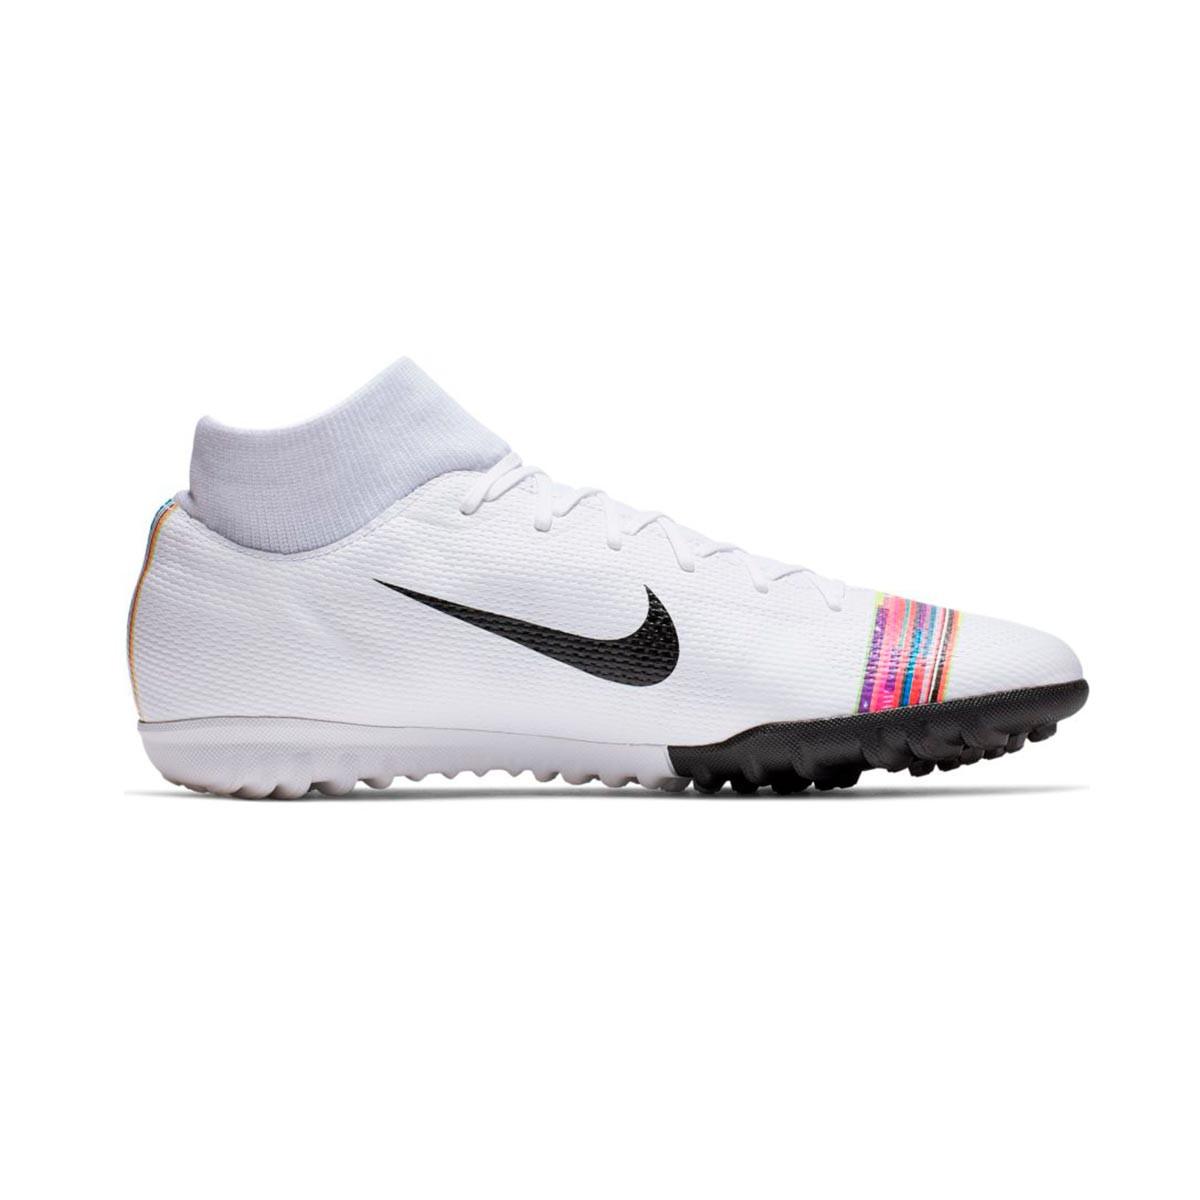 a52b8f6f8ae Tenis Nike Mercurial SuperflyX VI Academy LVL UP Turf White-Black-Pure  platinum - Tienda de fútbol Fútbol Emotion